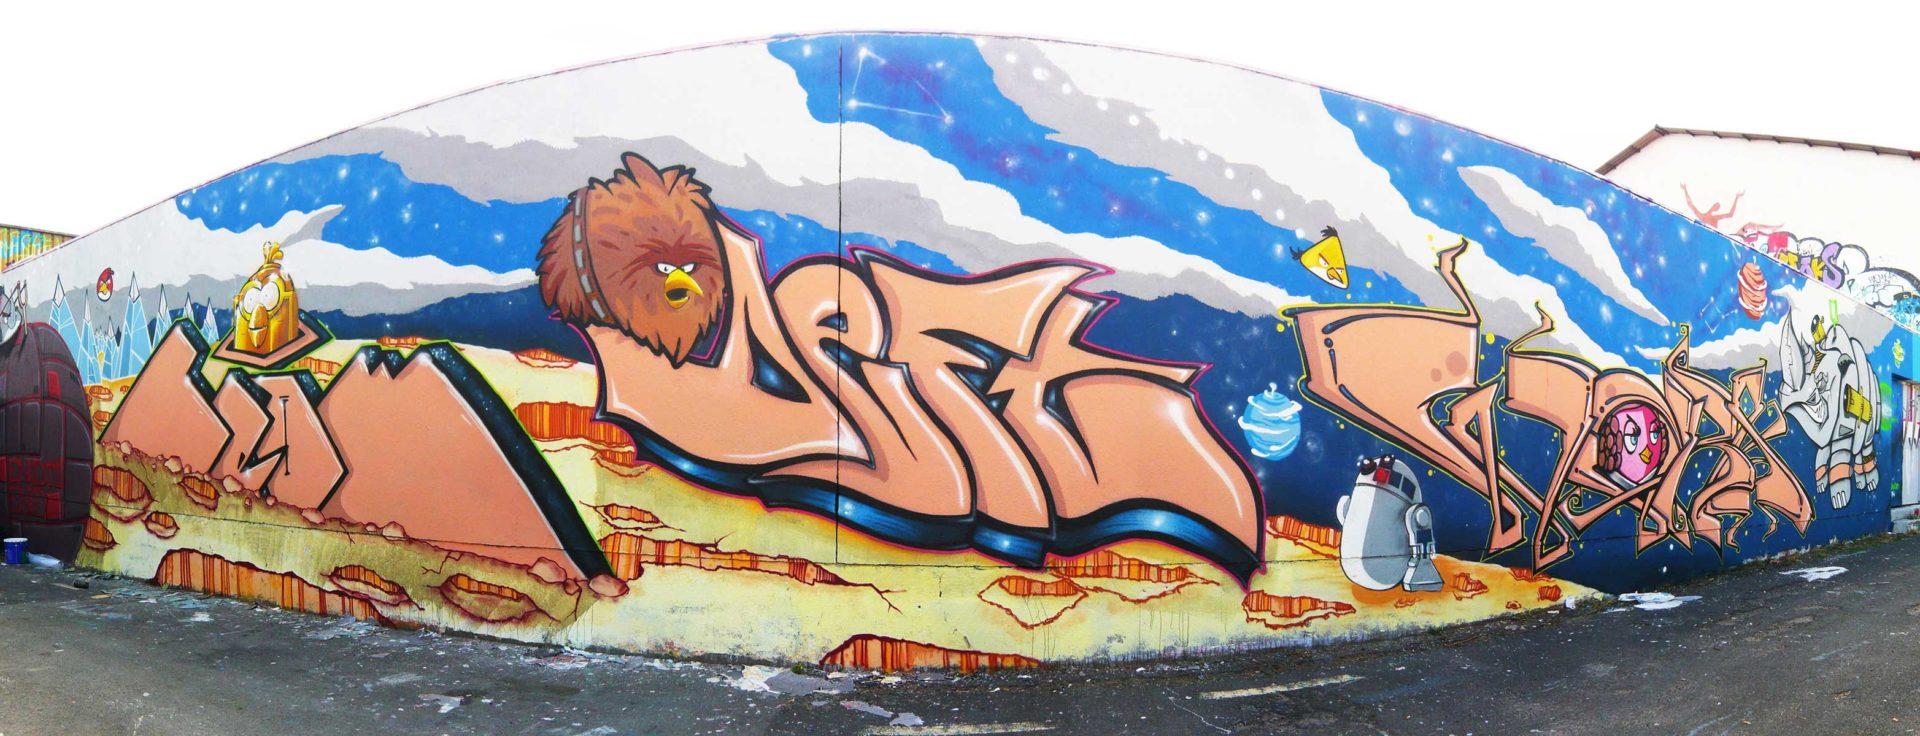 angry-birds-graffiti-3